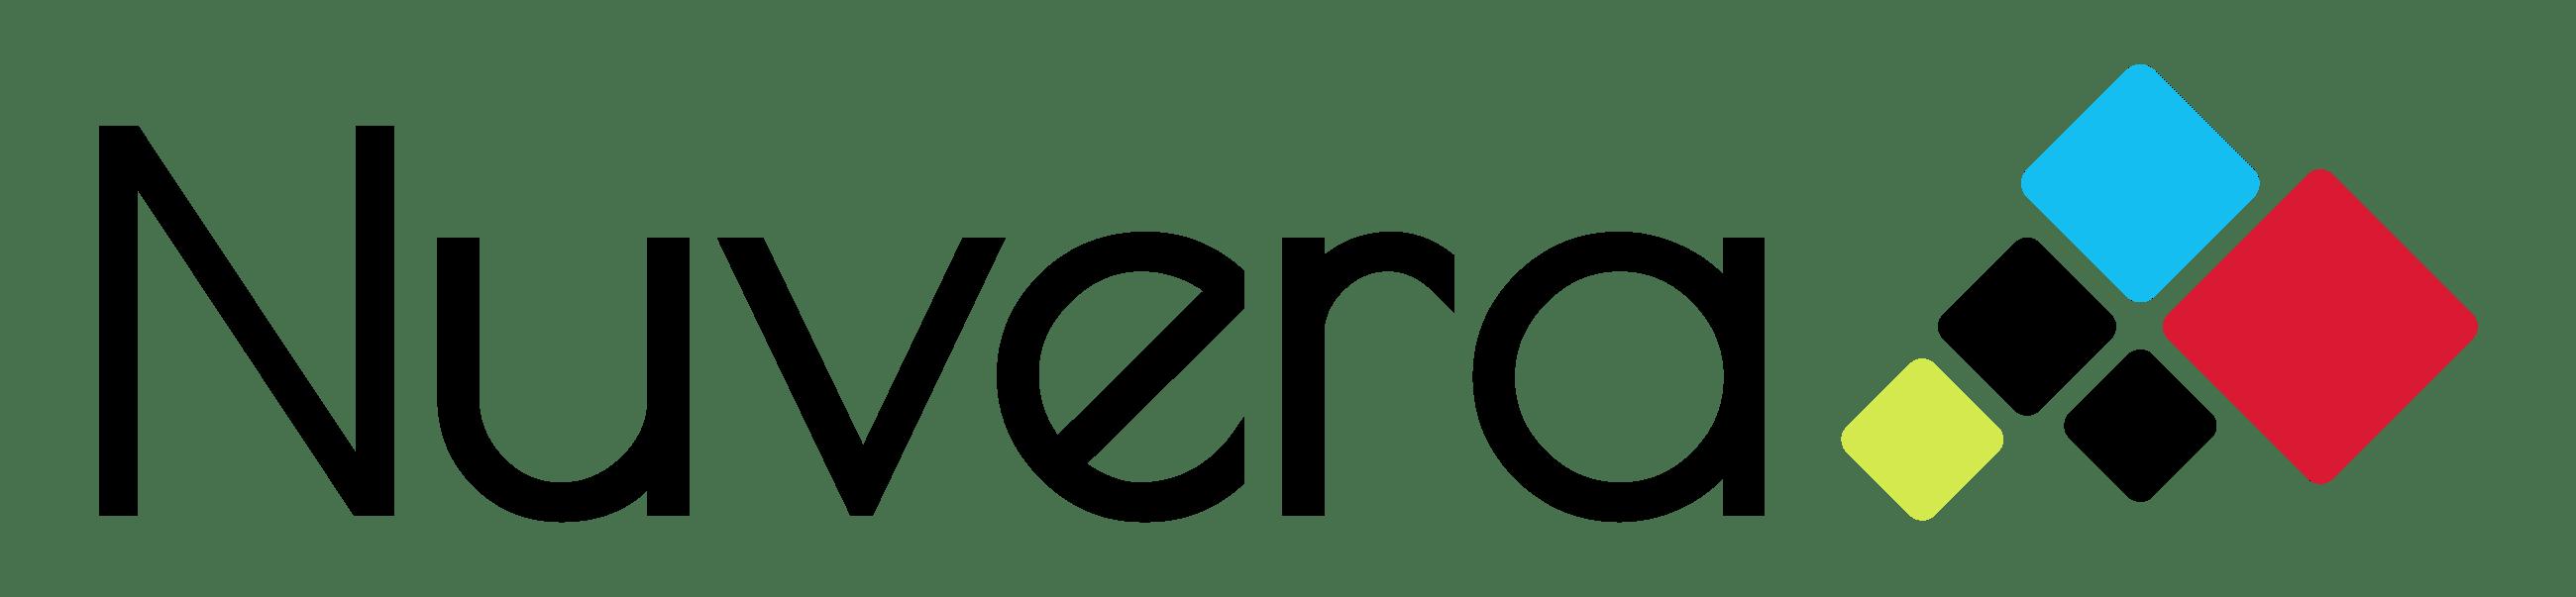 Nuvera Rgb Logo Horizontal Color